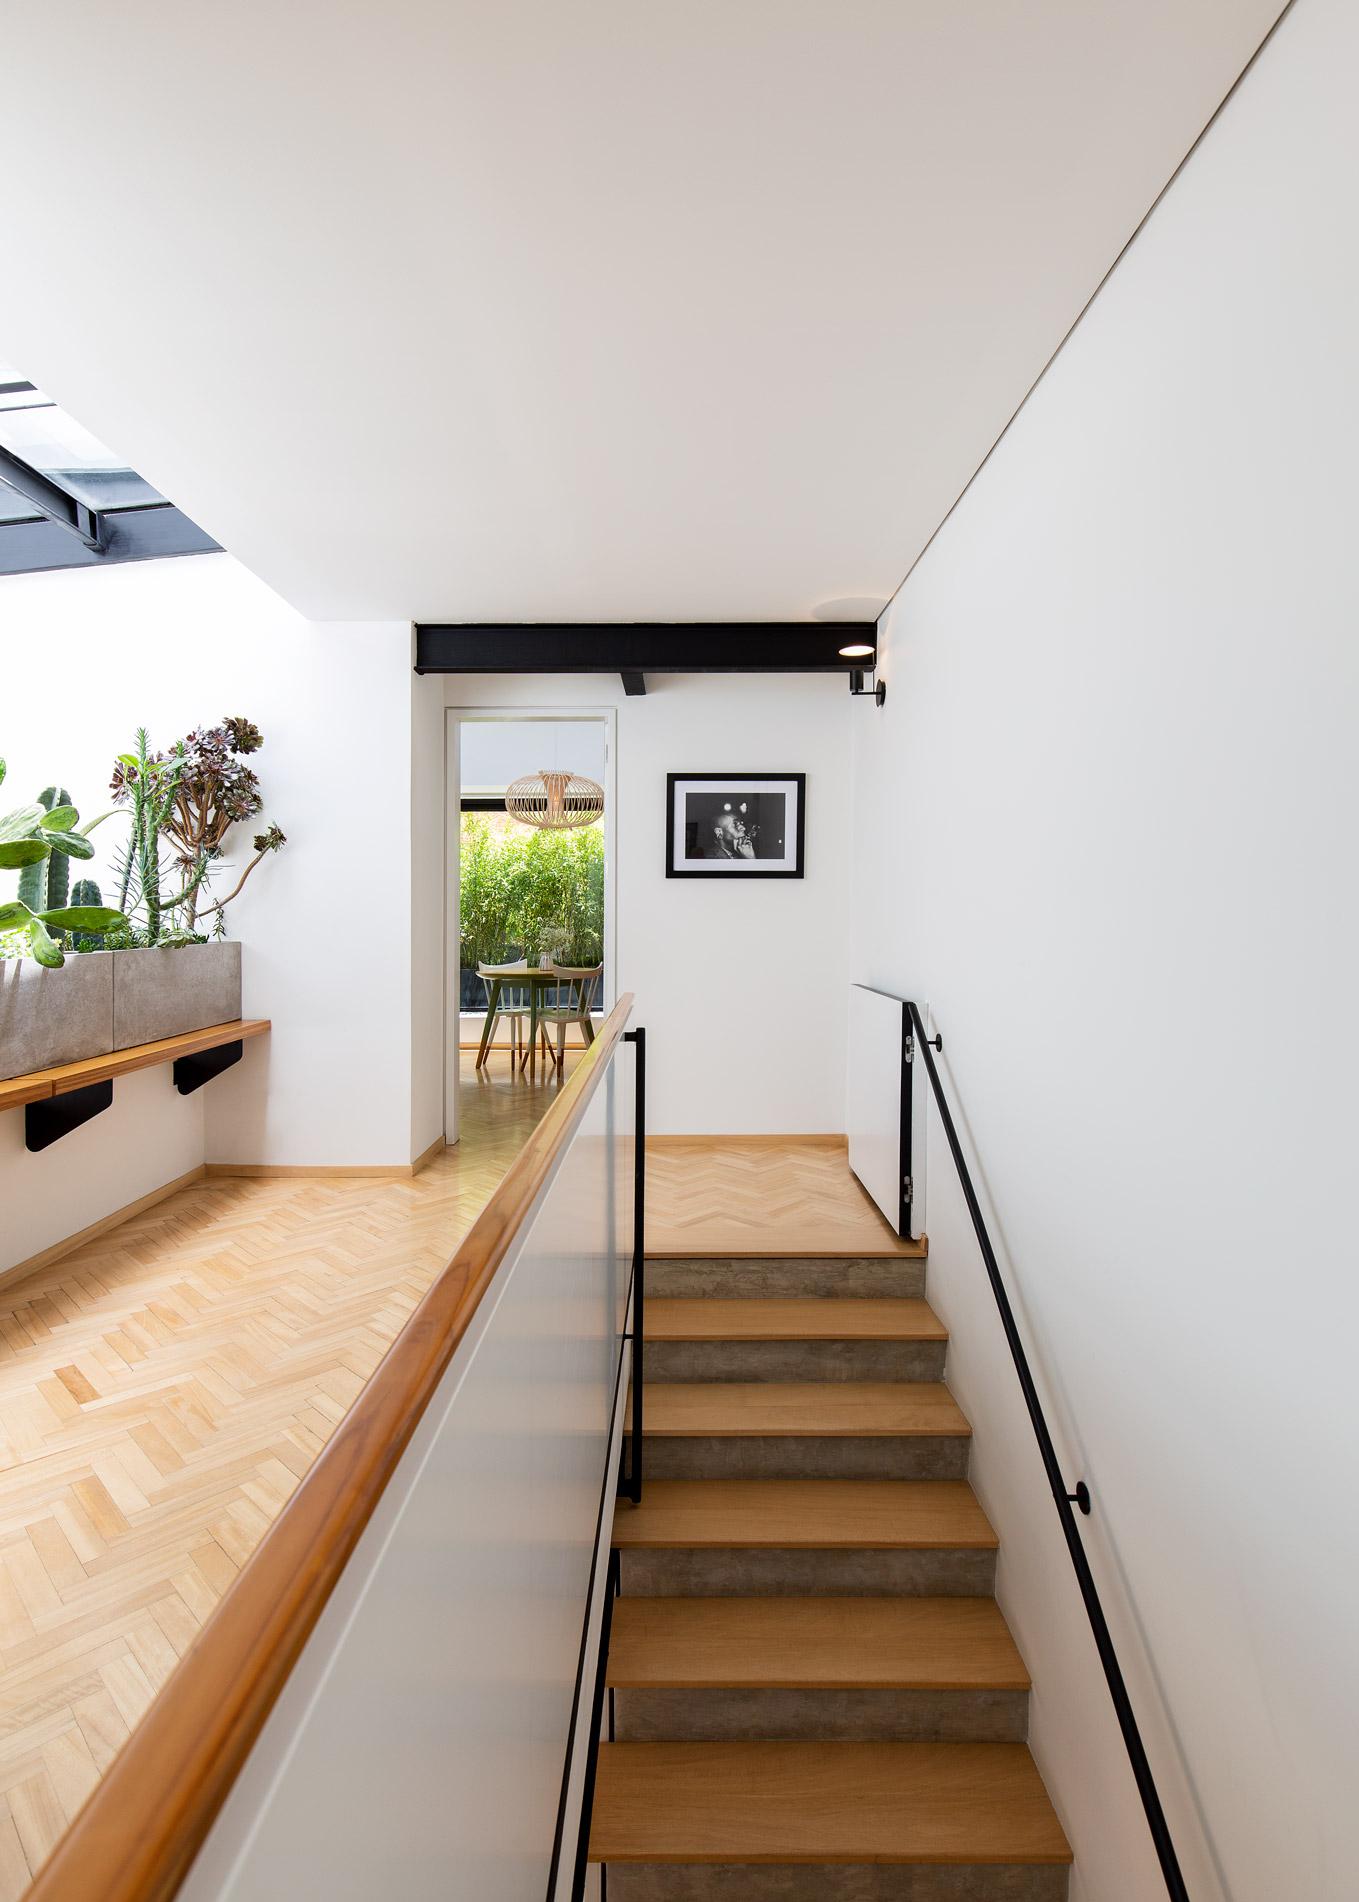 06.oberlaenderarquitectos.arquitectura.simonboschphotography.simon.bosch.bogota.interior.habitar